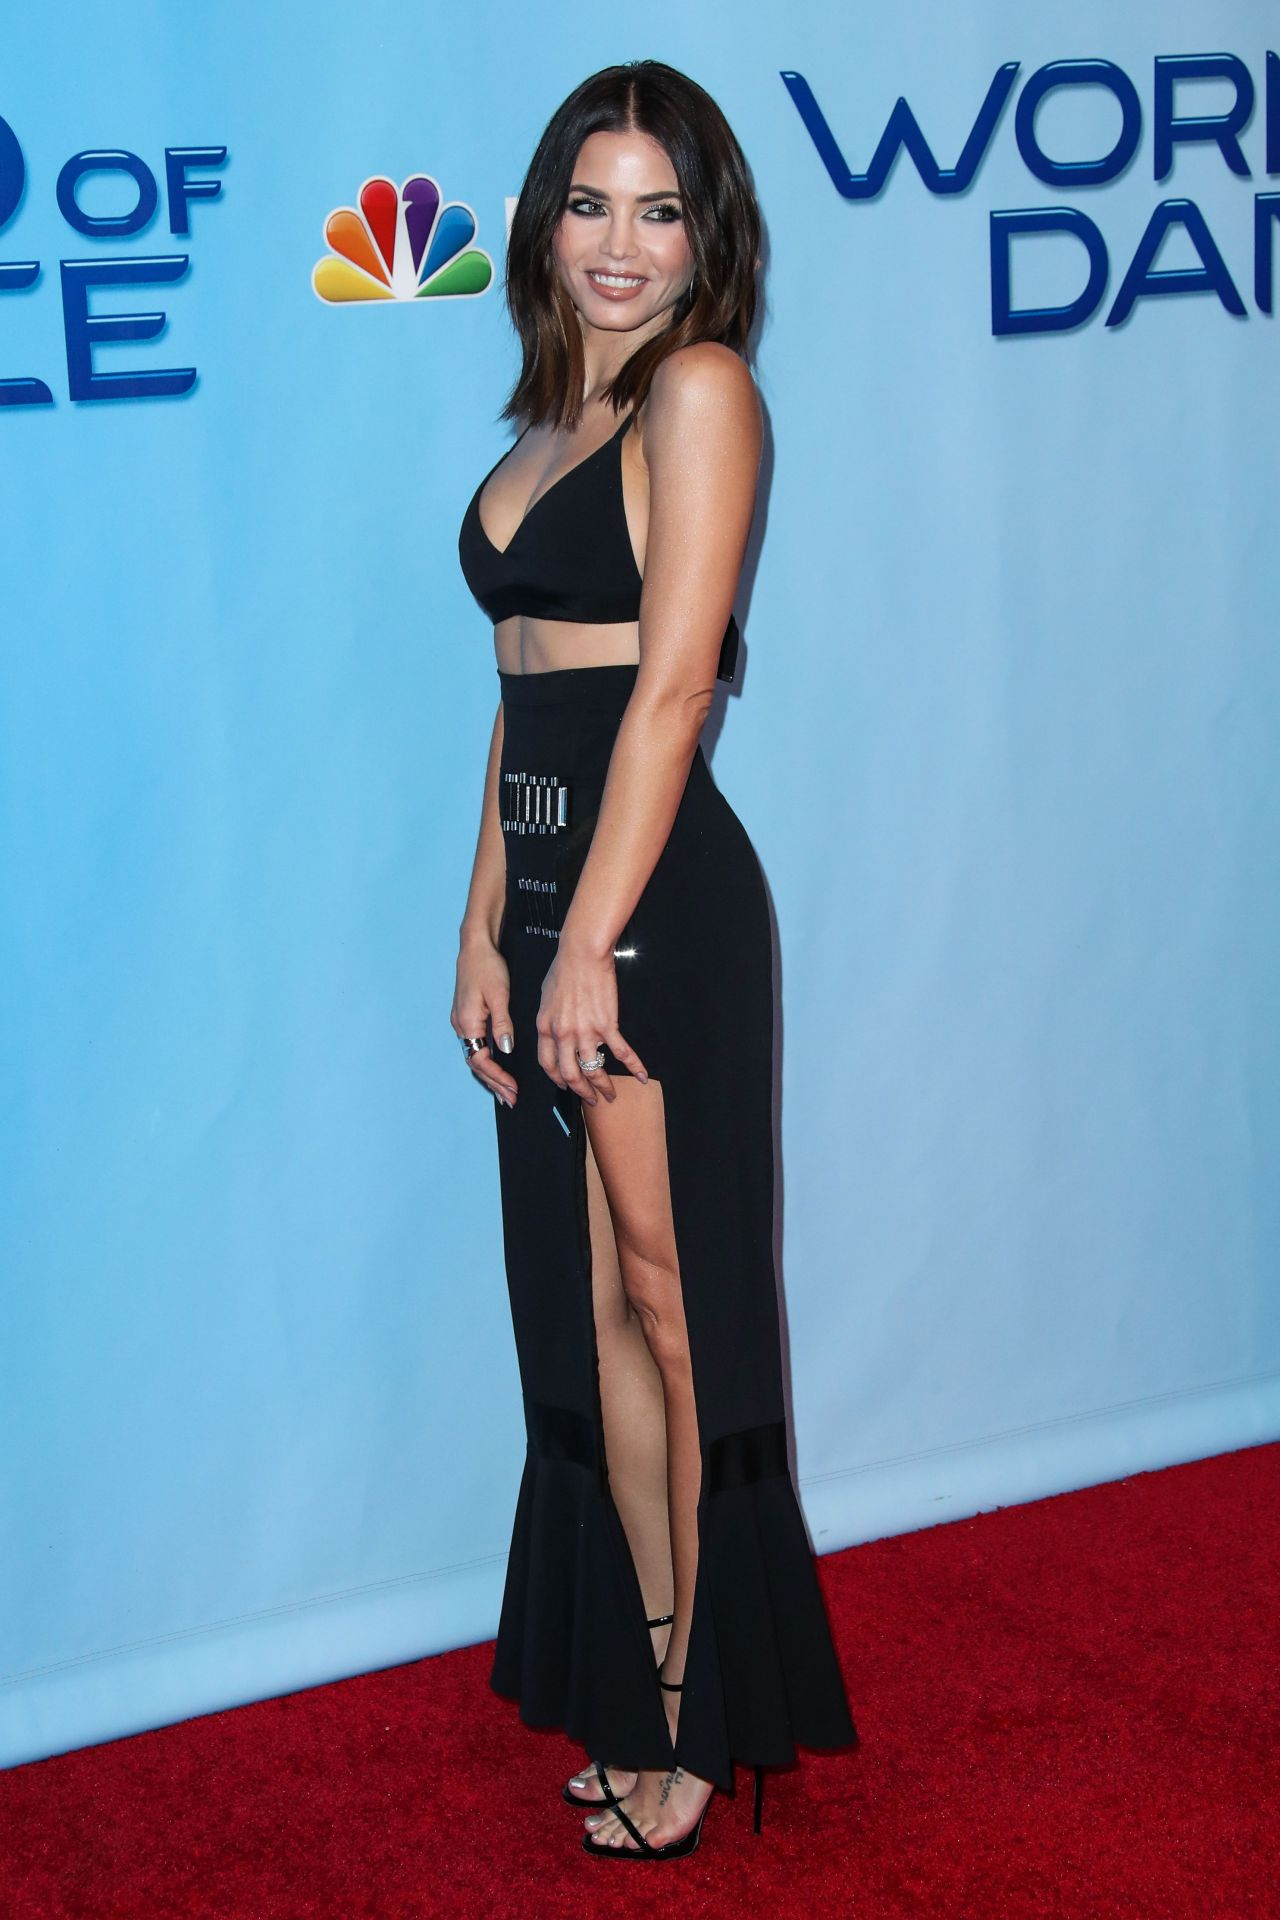 Jenna Dewan Tatum World Of Dance TV Show Premiere In Los